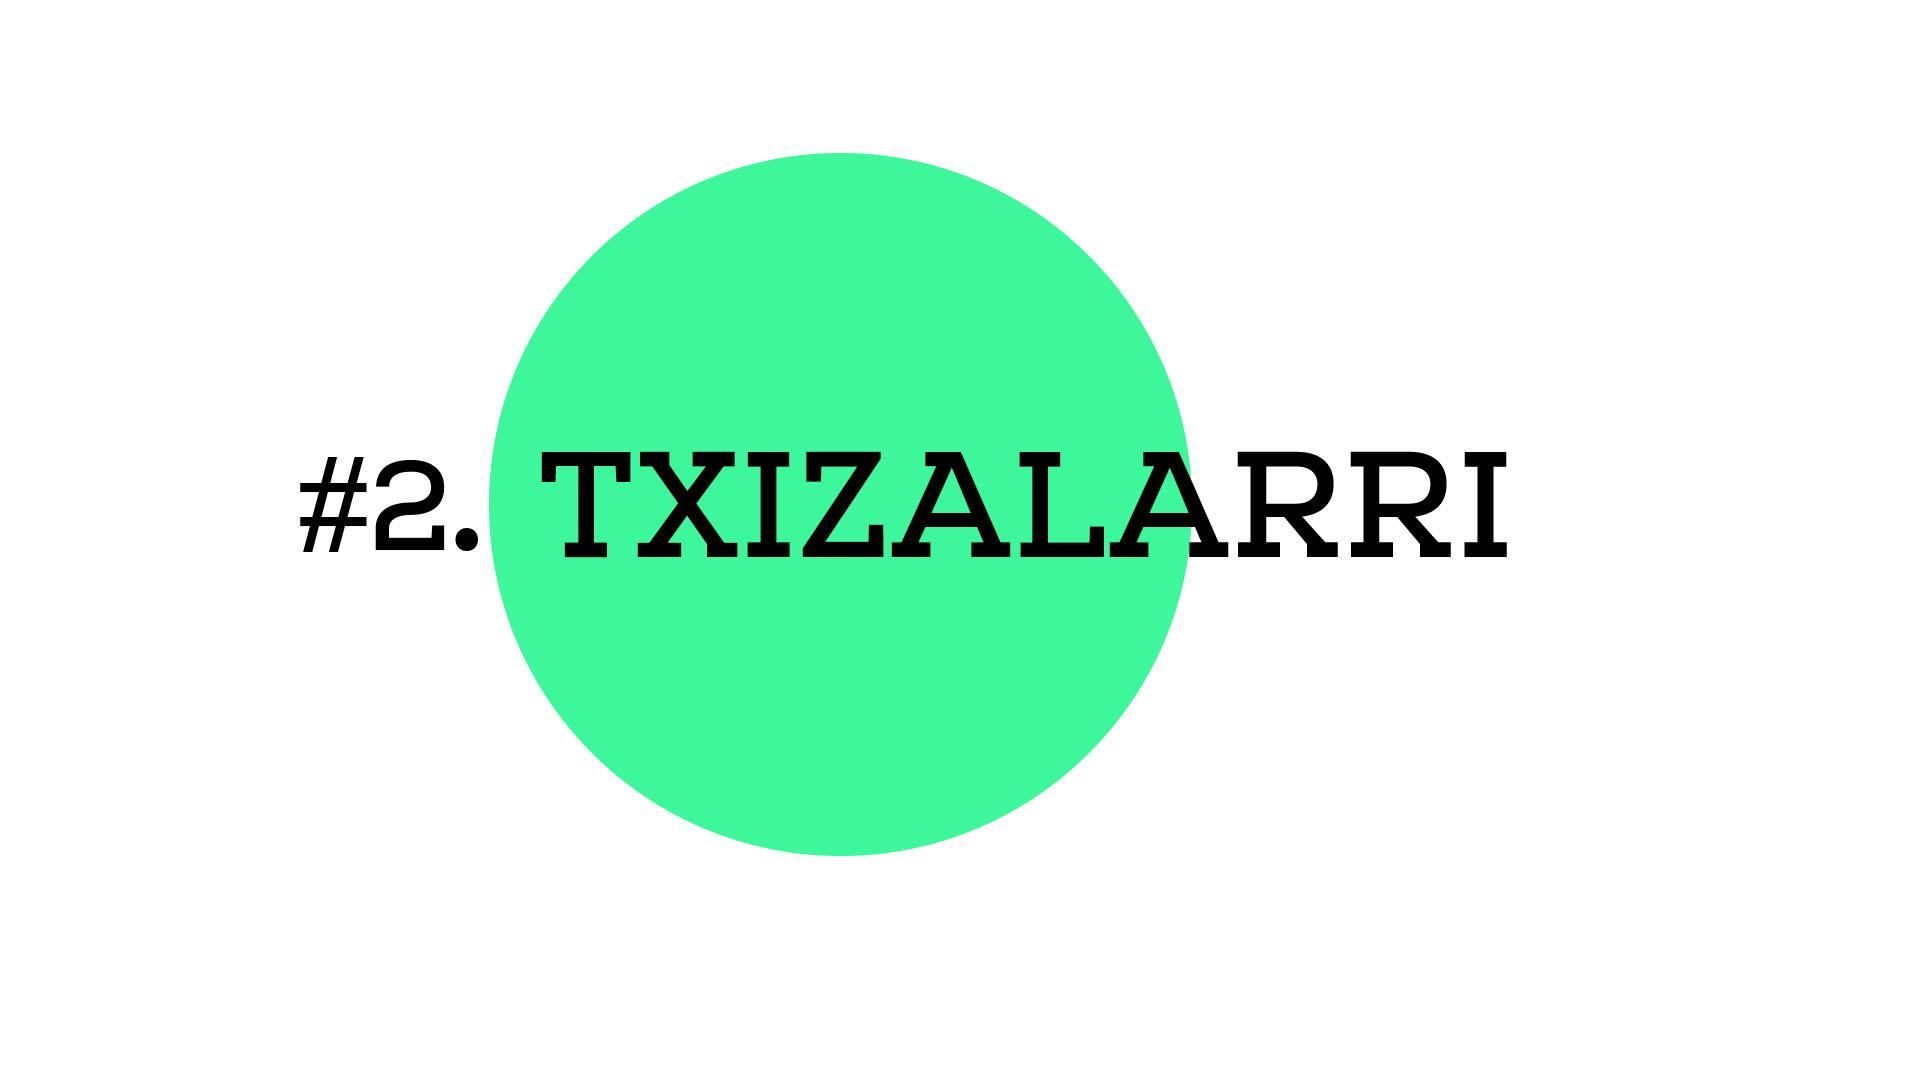 Txizalarri (A2e02)